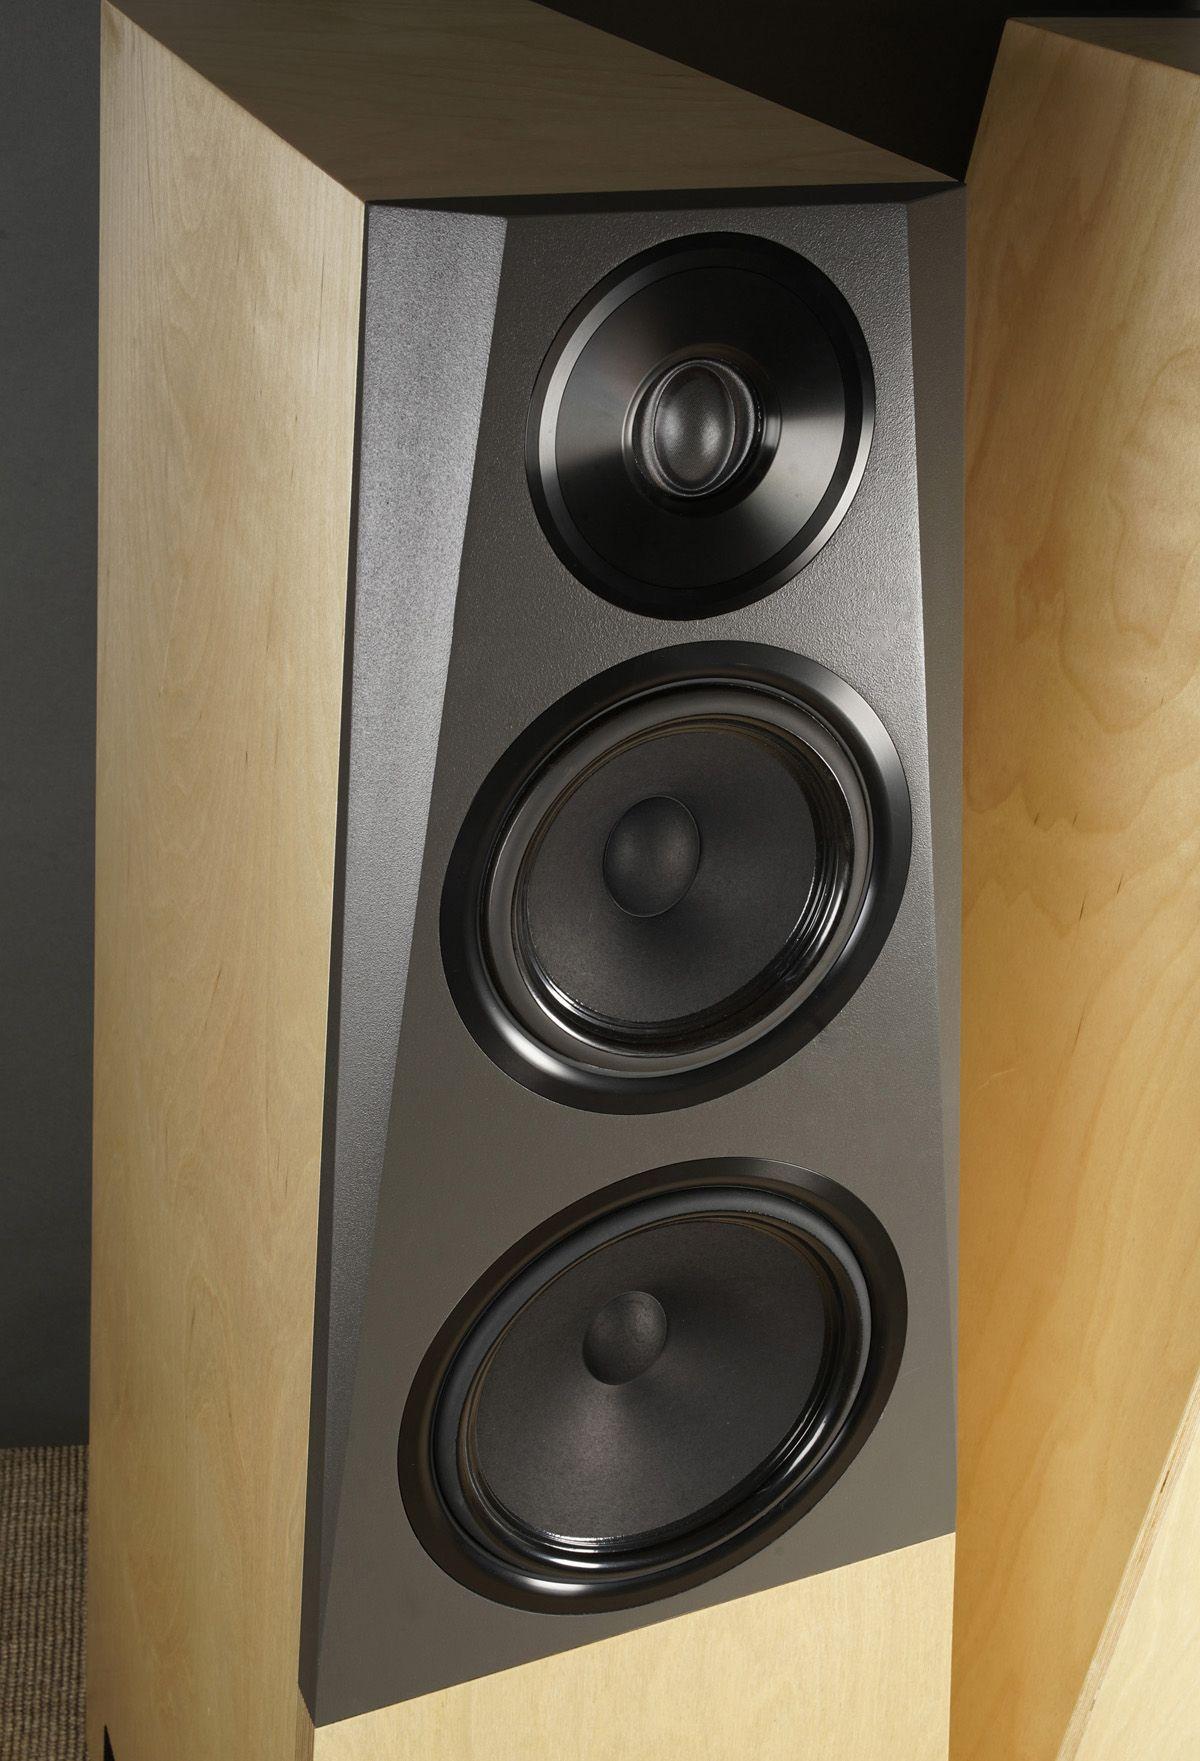 Ellipticor 3 Speaker Box In 2019 Speaker Box Design